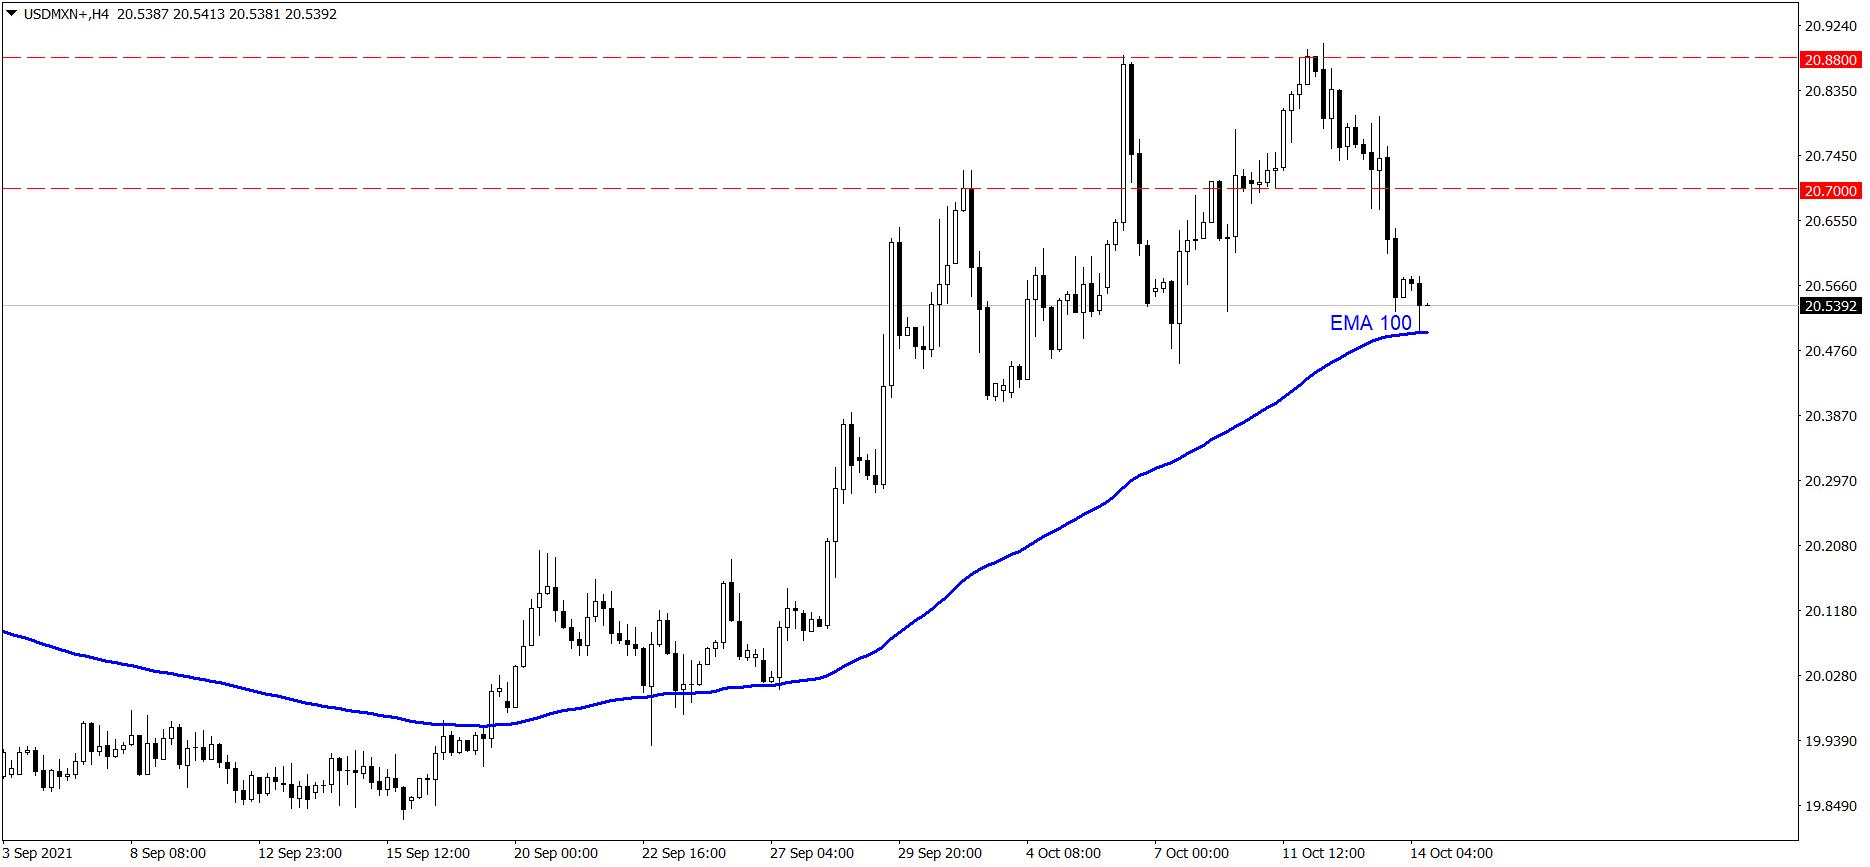 Wykres USD/MXN